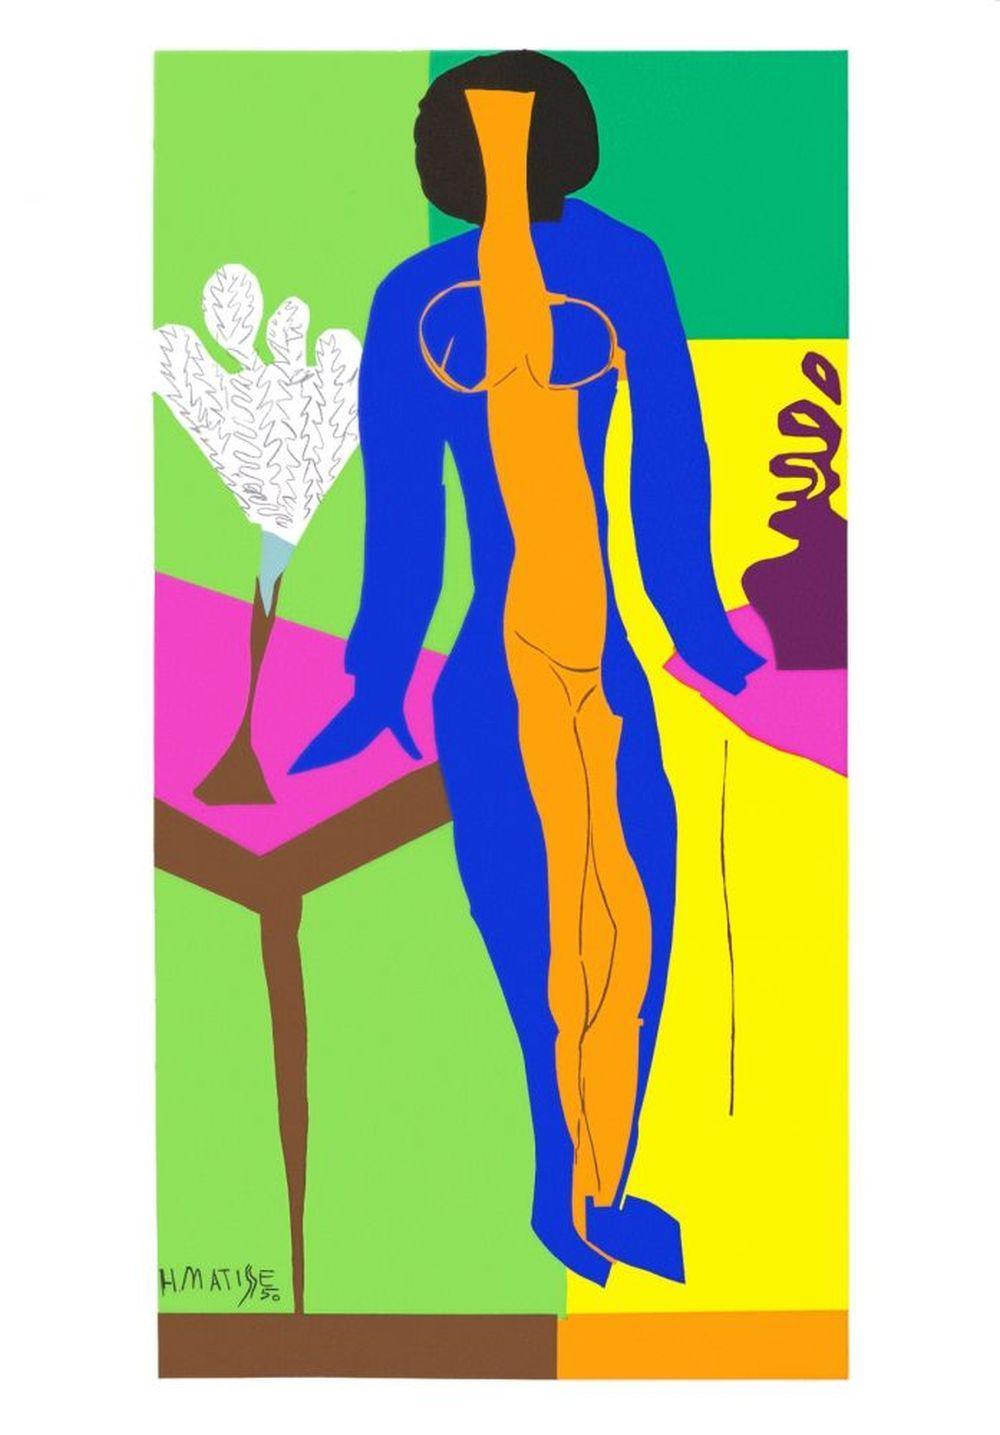 Henri Matisse - Zulma, 1950